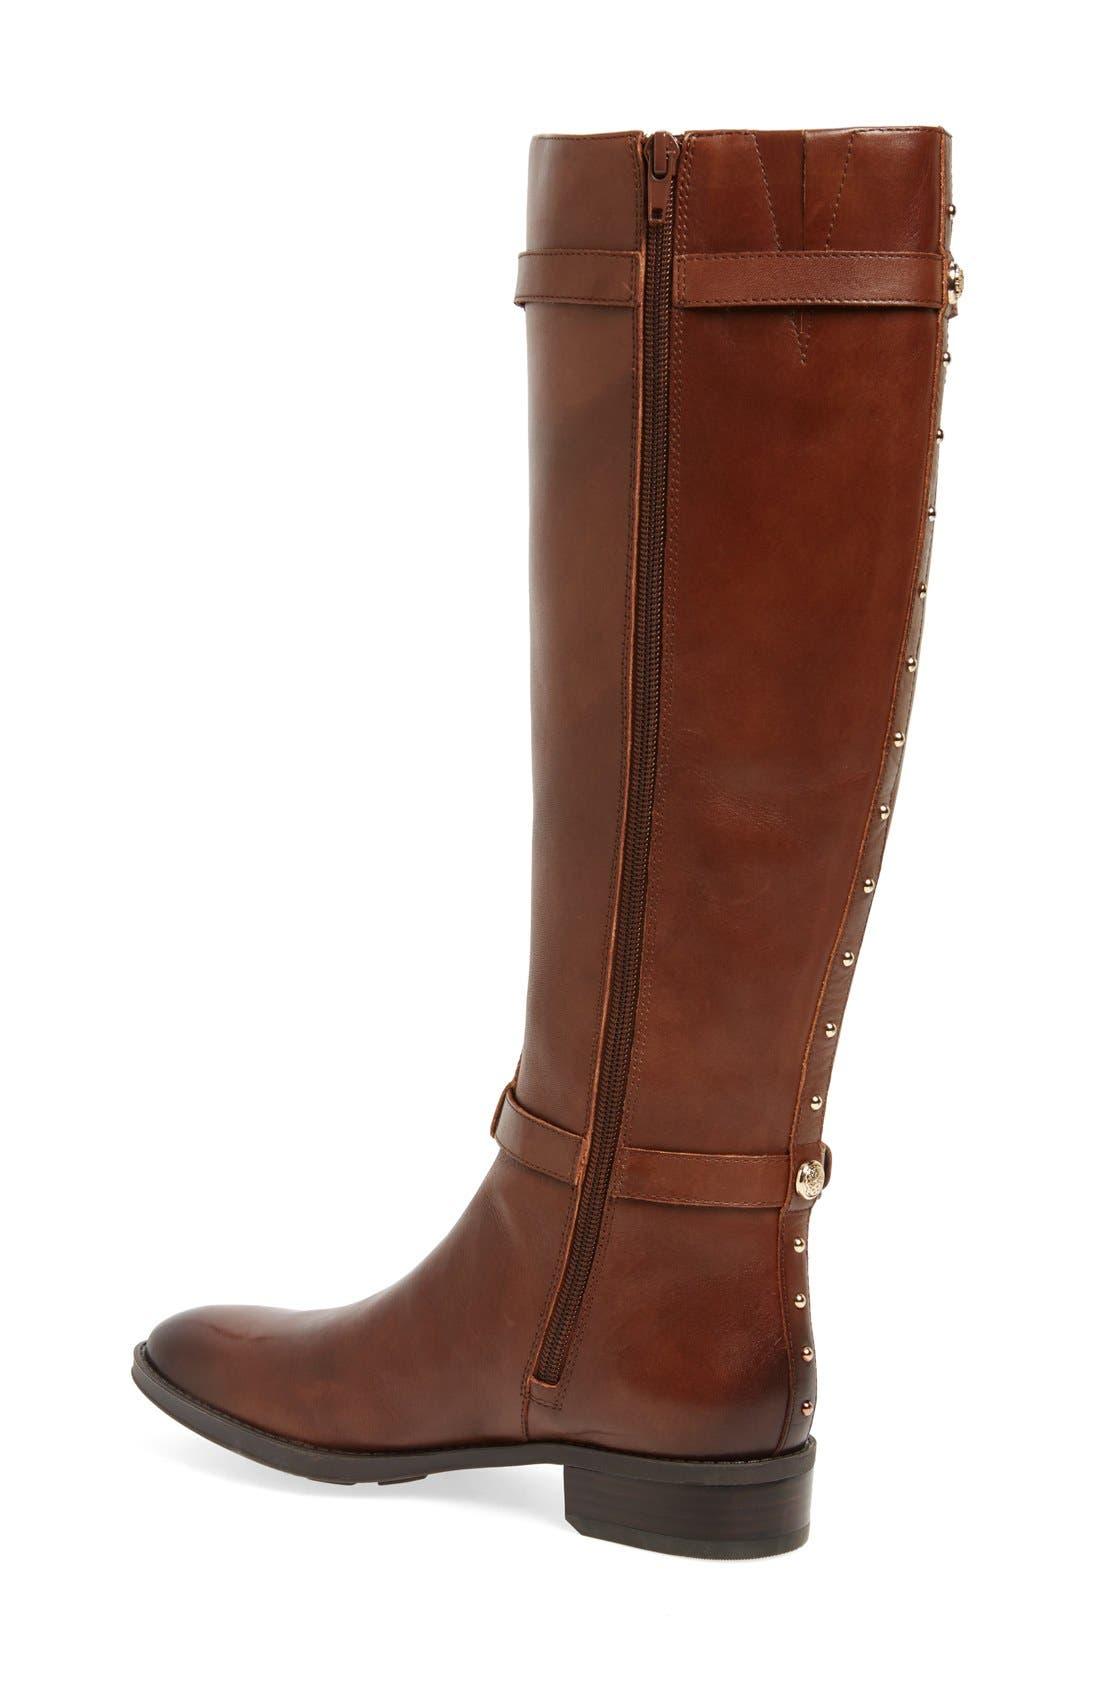 Alternate Image 2  - Vince Camuto 'Preslen' Riding Boot (Women) (Wide Calf)